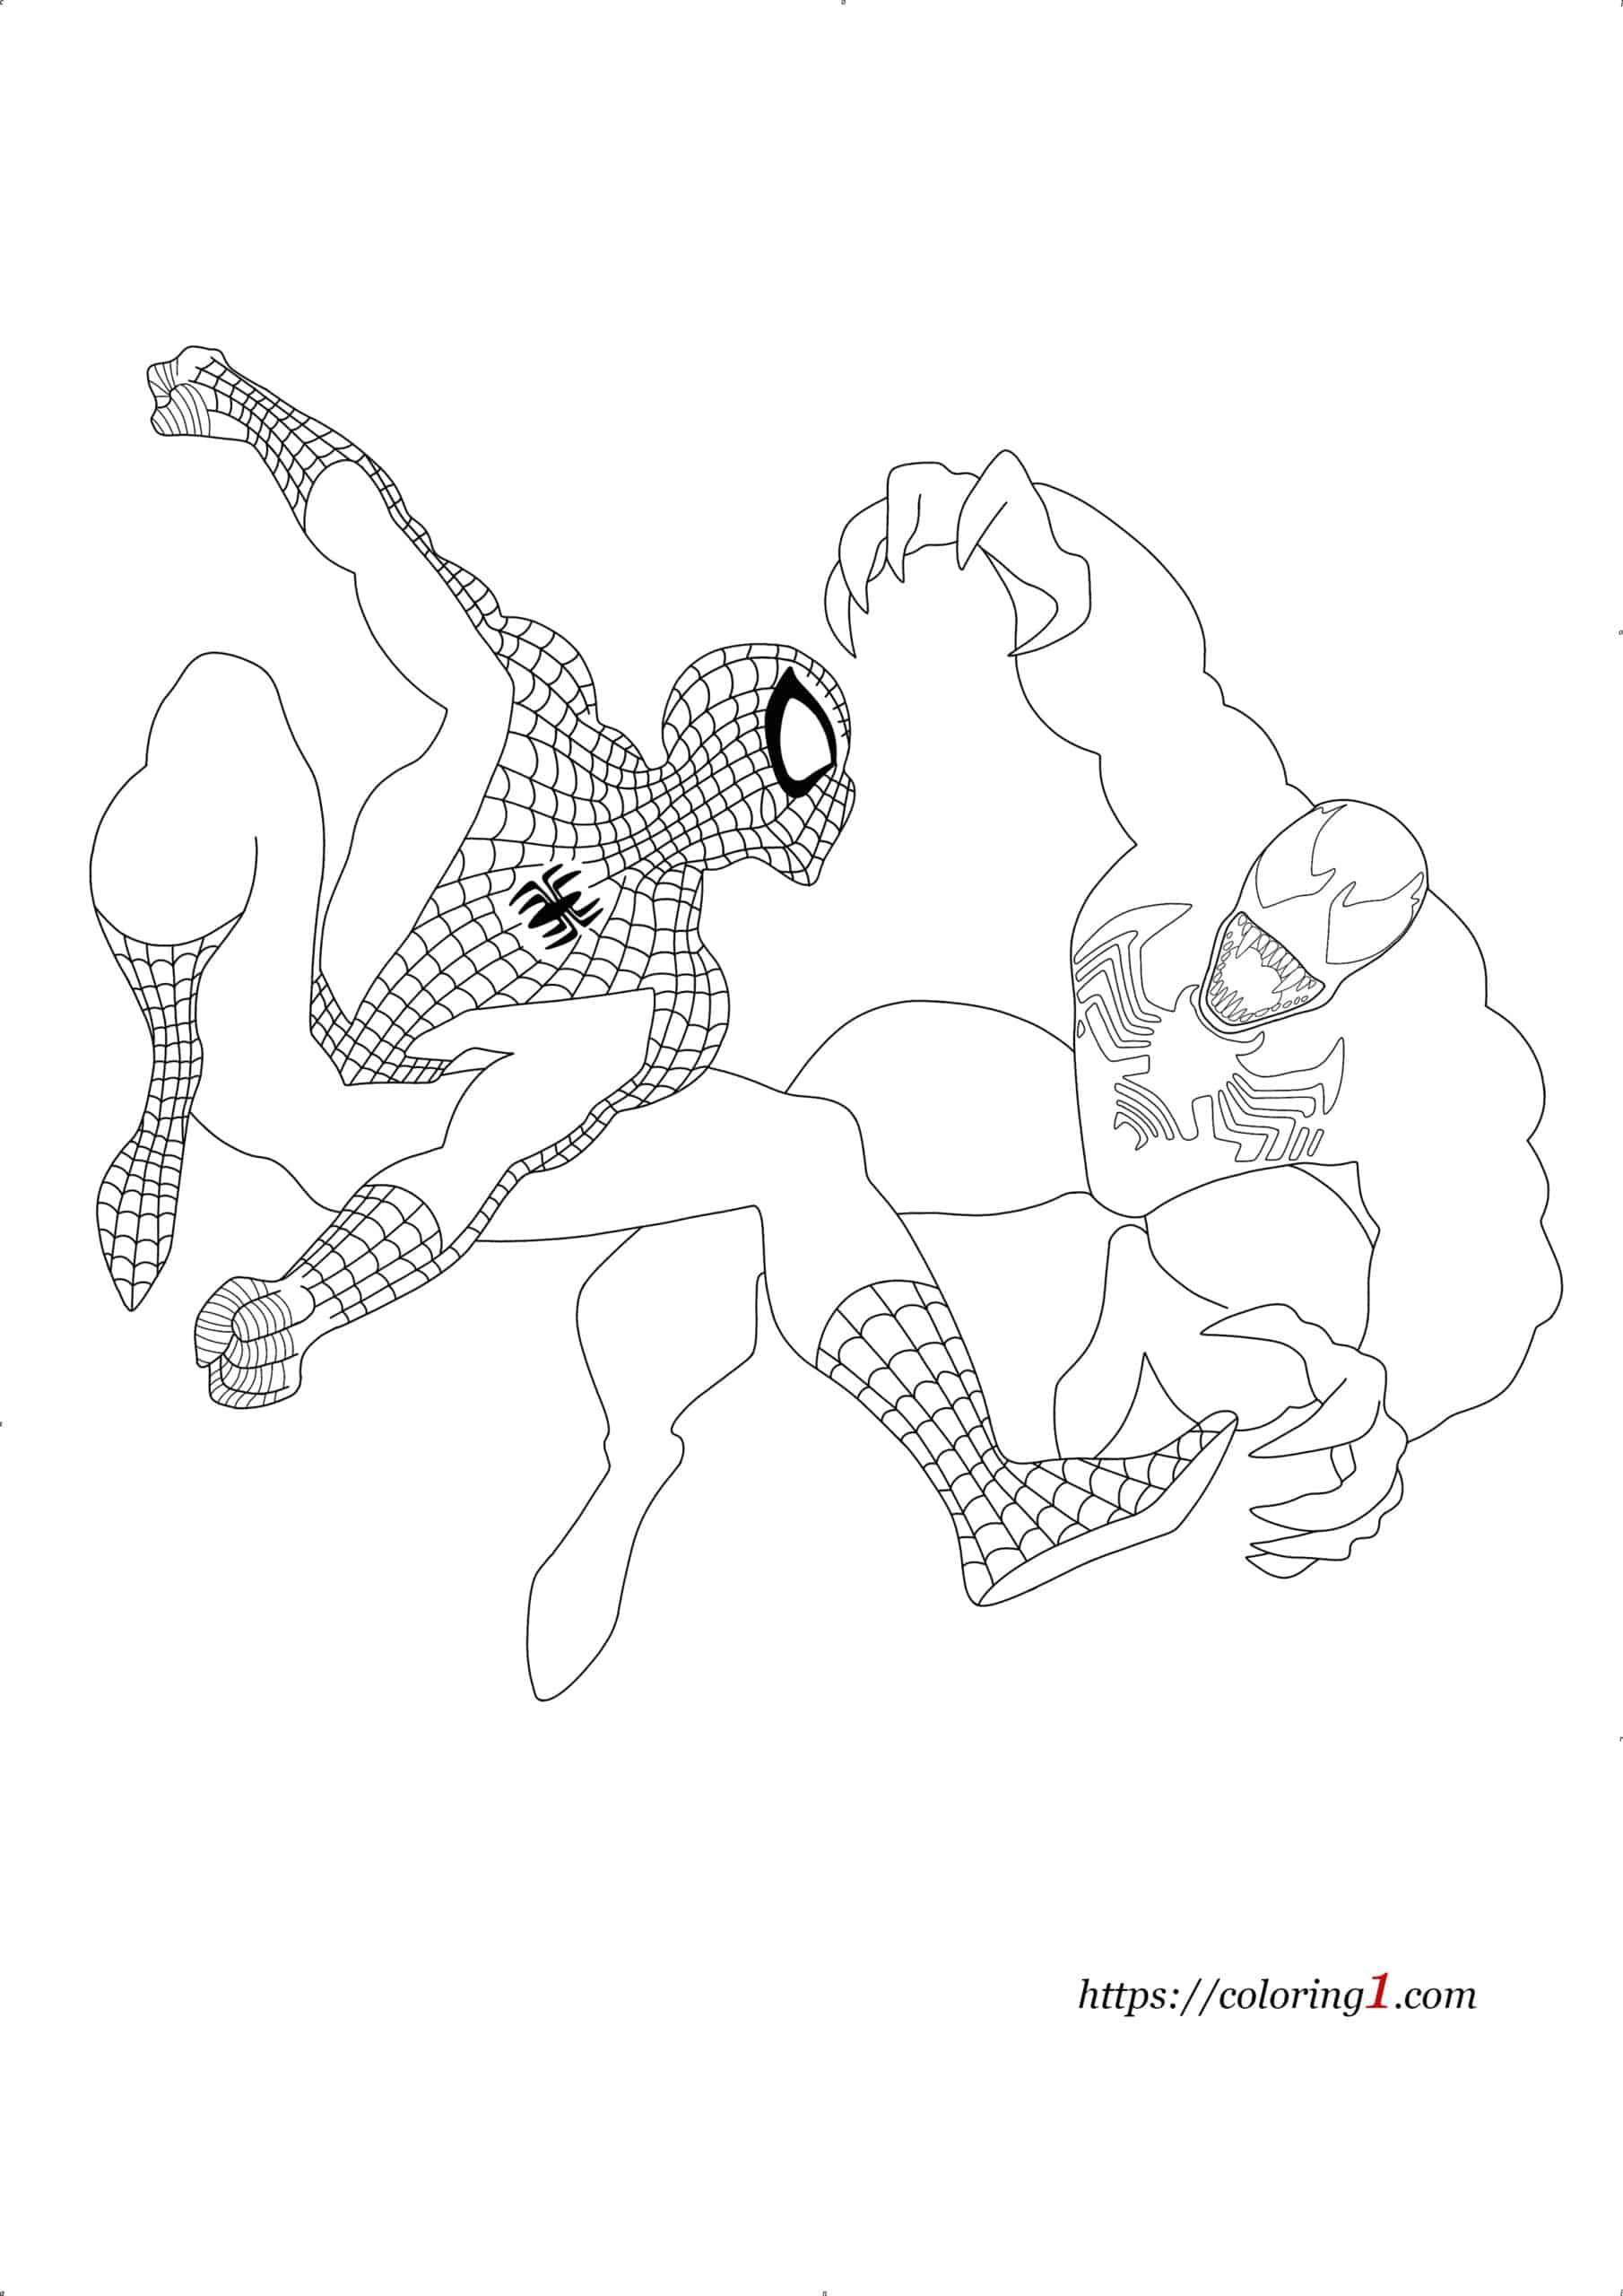 Venom vs Spiderman coloring page